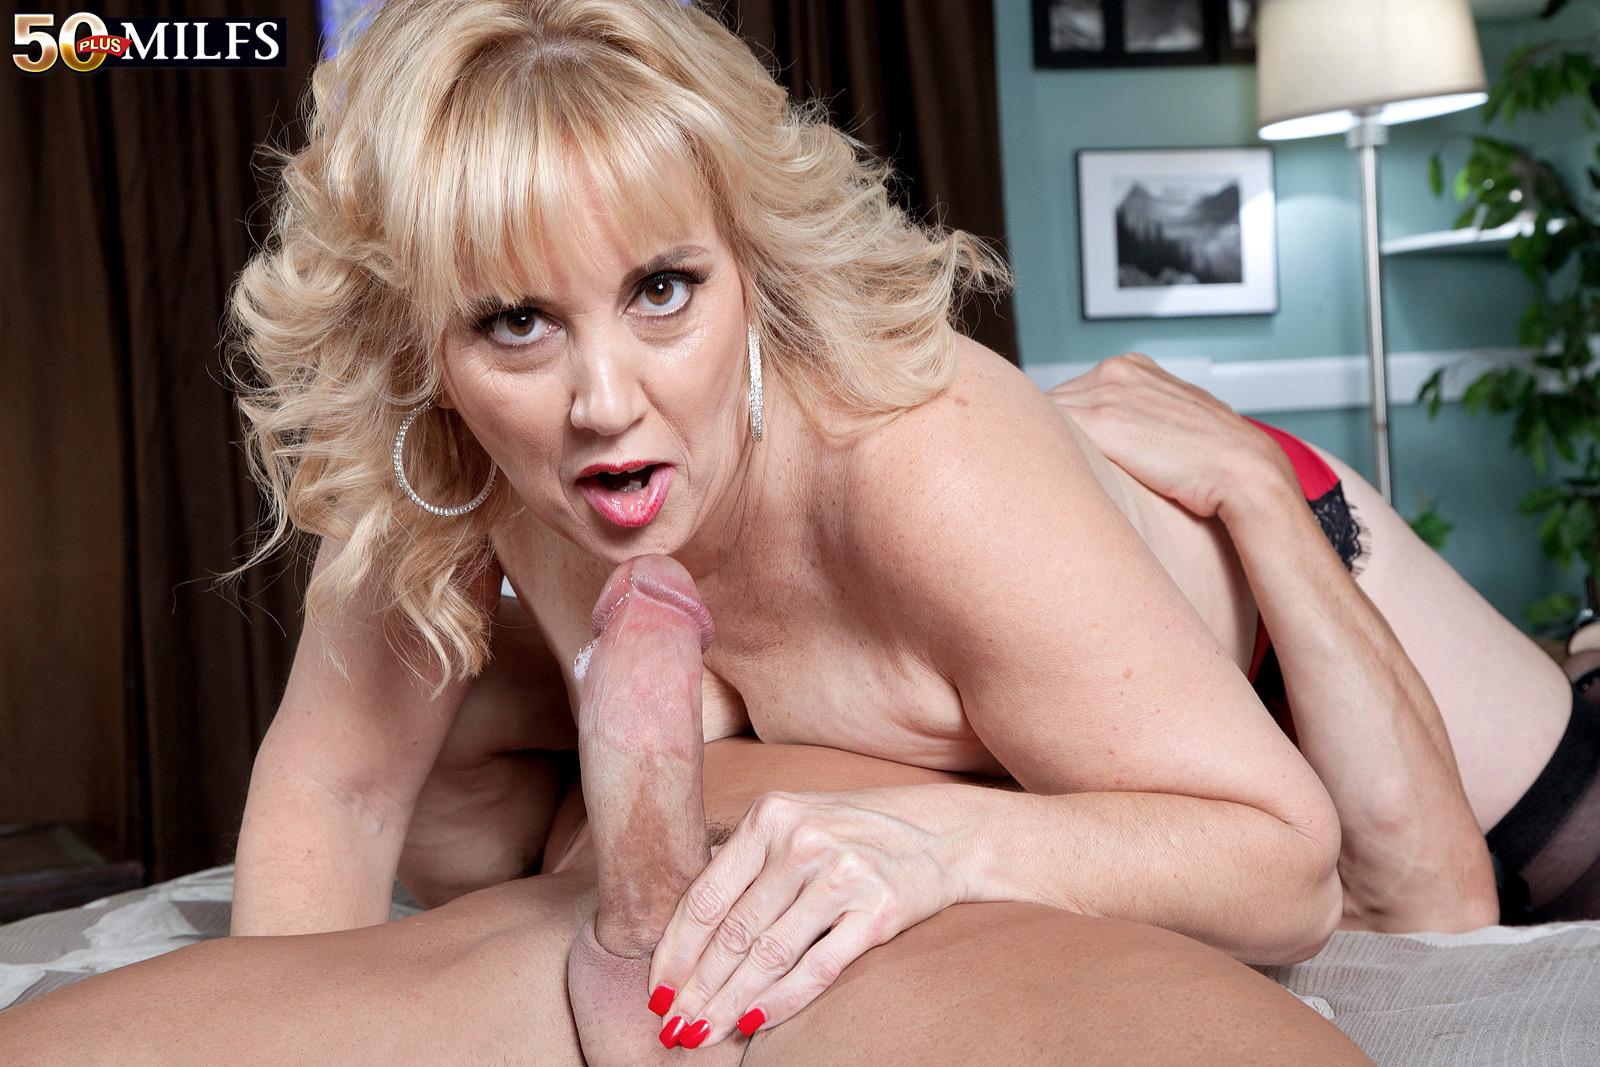 mature-milf-xxx-preview-italian-amature-girls-topless